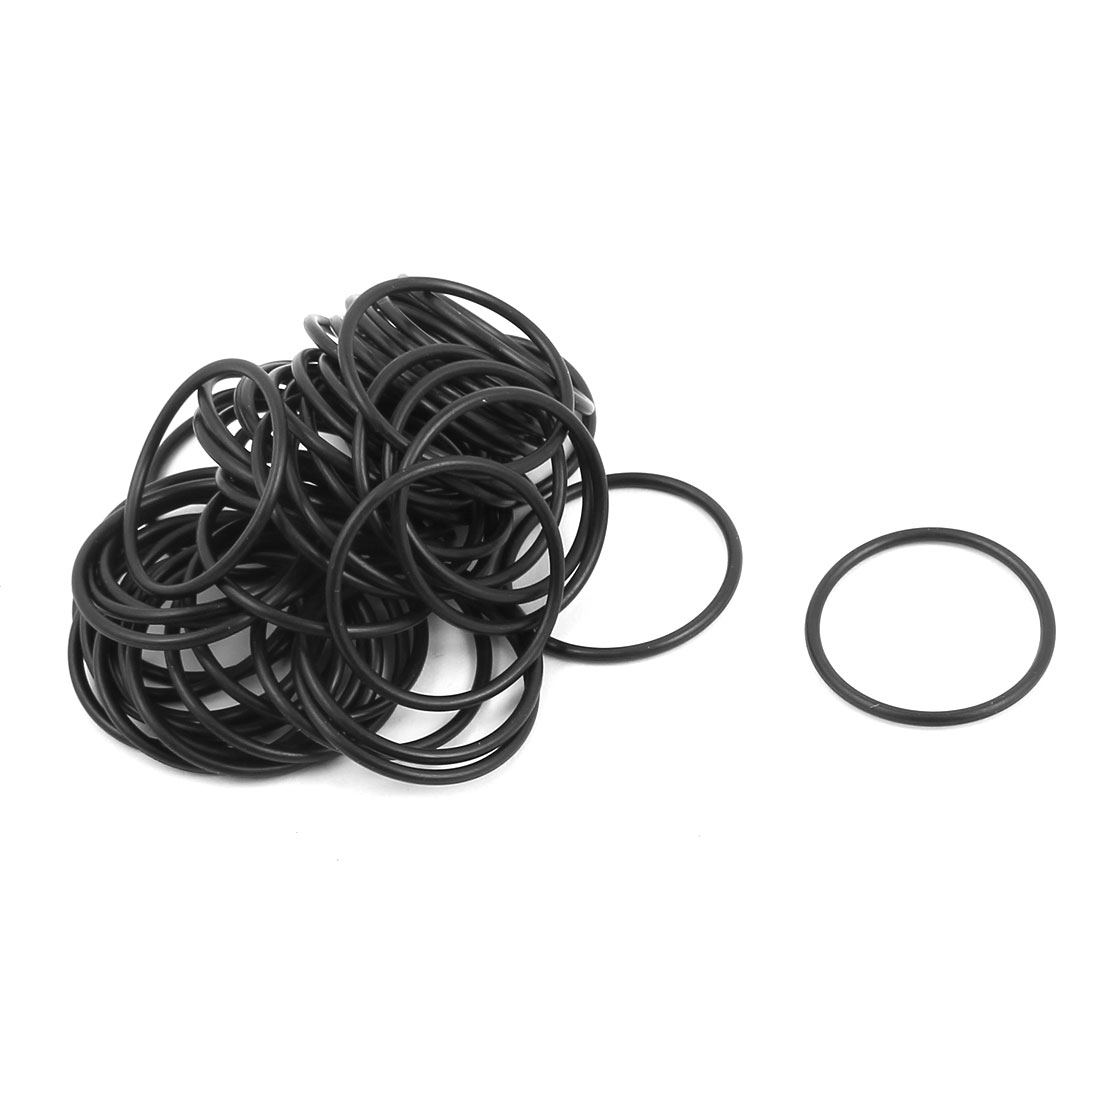 50 Pcs Black 24mm x 1.5mm Nitrile Rubber O Ring NBR Oil Sealing Grommets